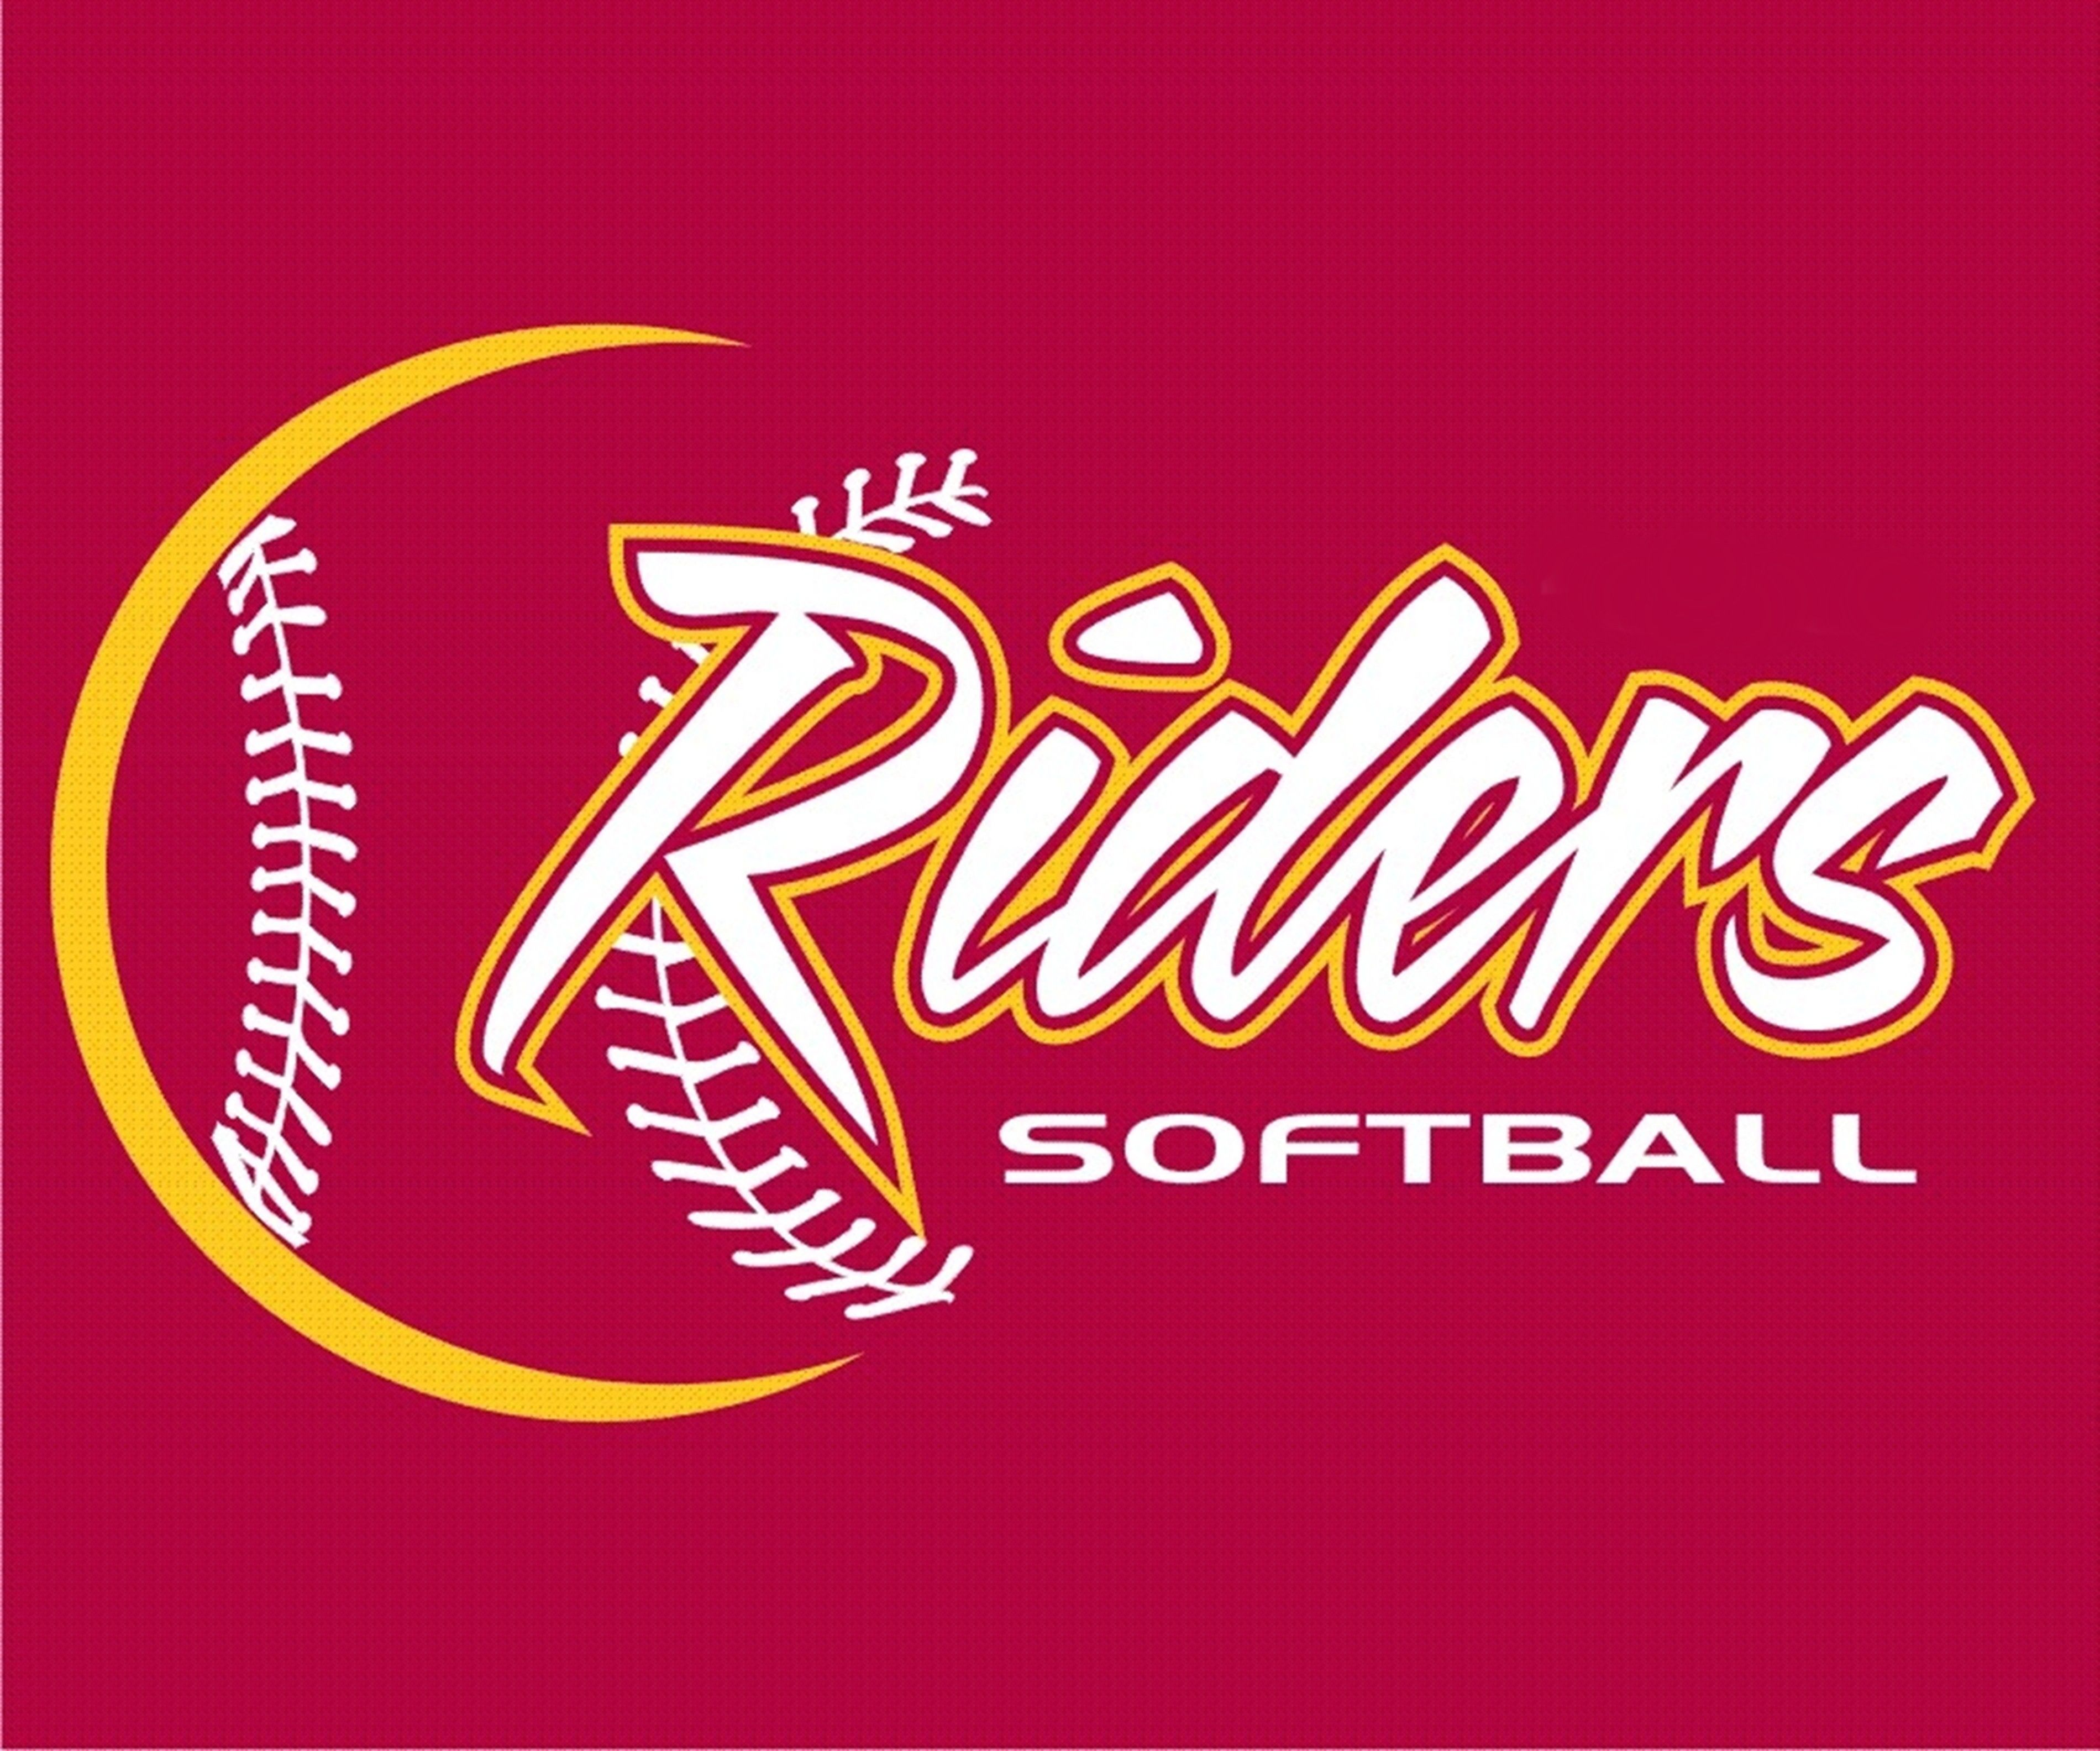 high school softball team logos yahoo image search results rh pinterest com softball team logos clip art softball team logo creator